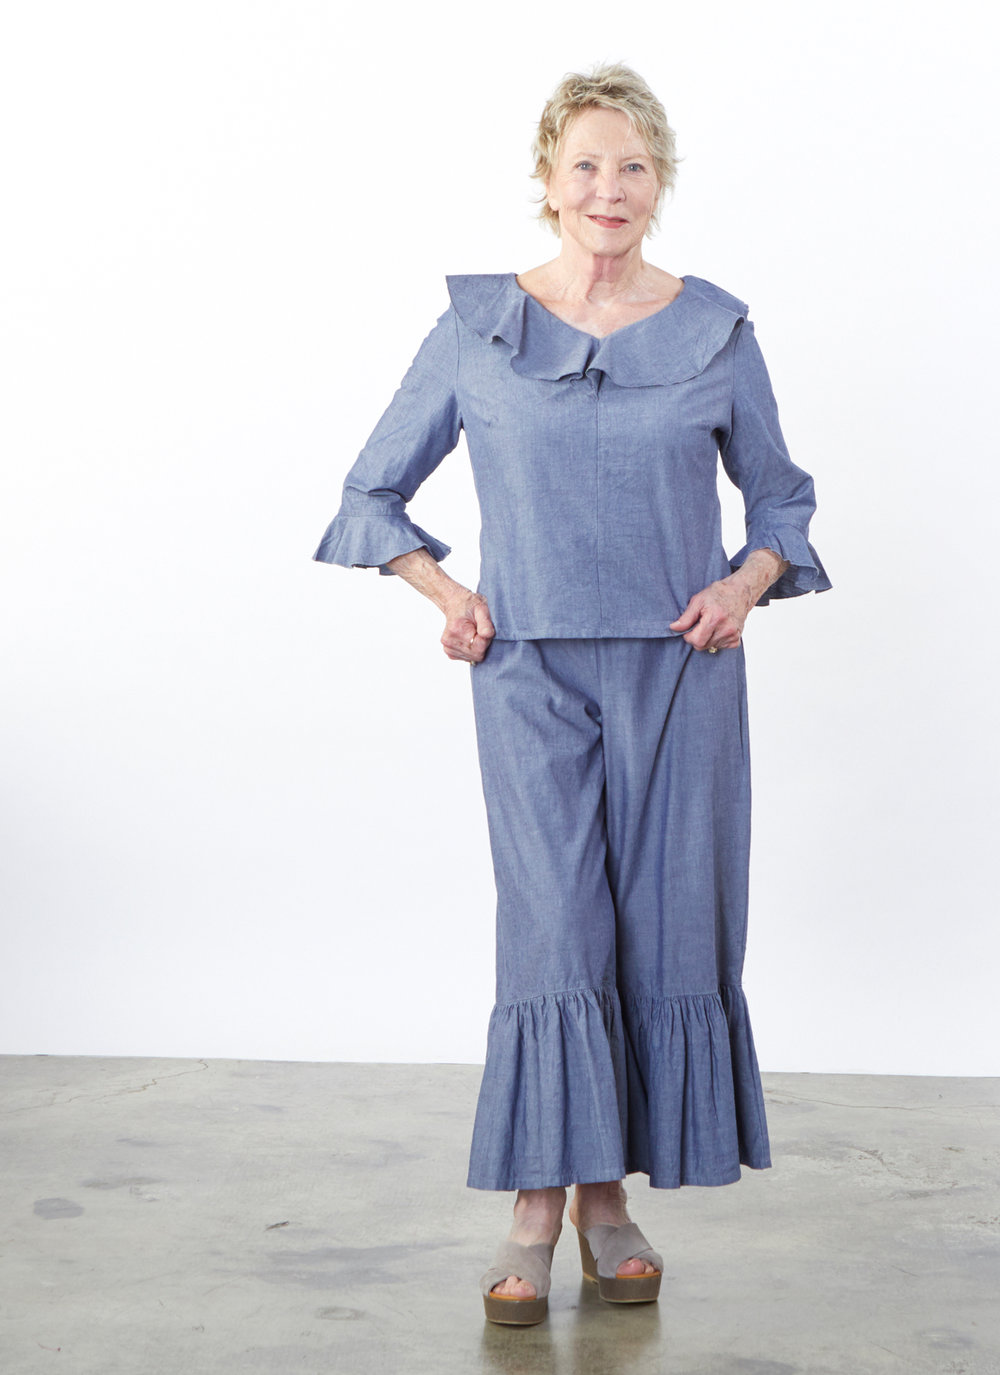 Georgia Shirt, Ruffle Pant in Oia Cotton Chambray